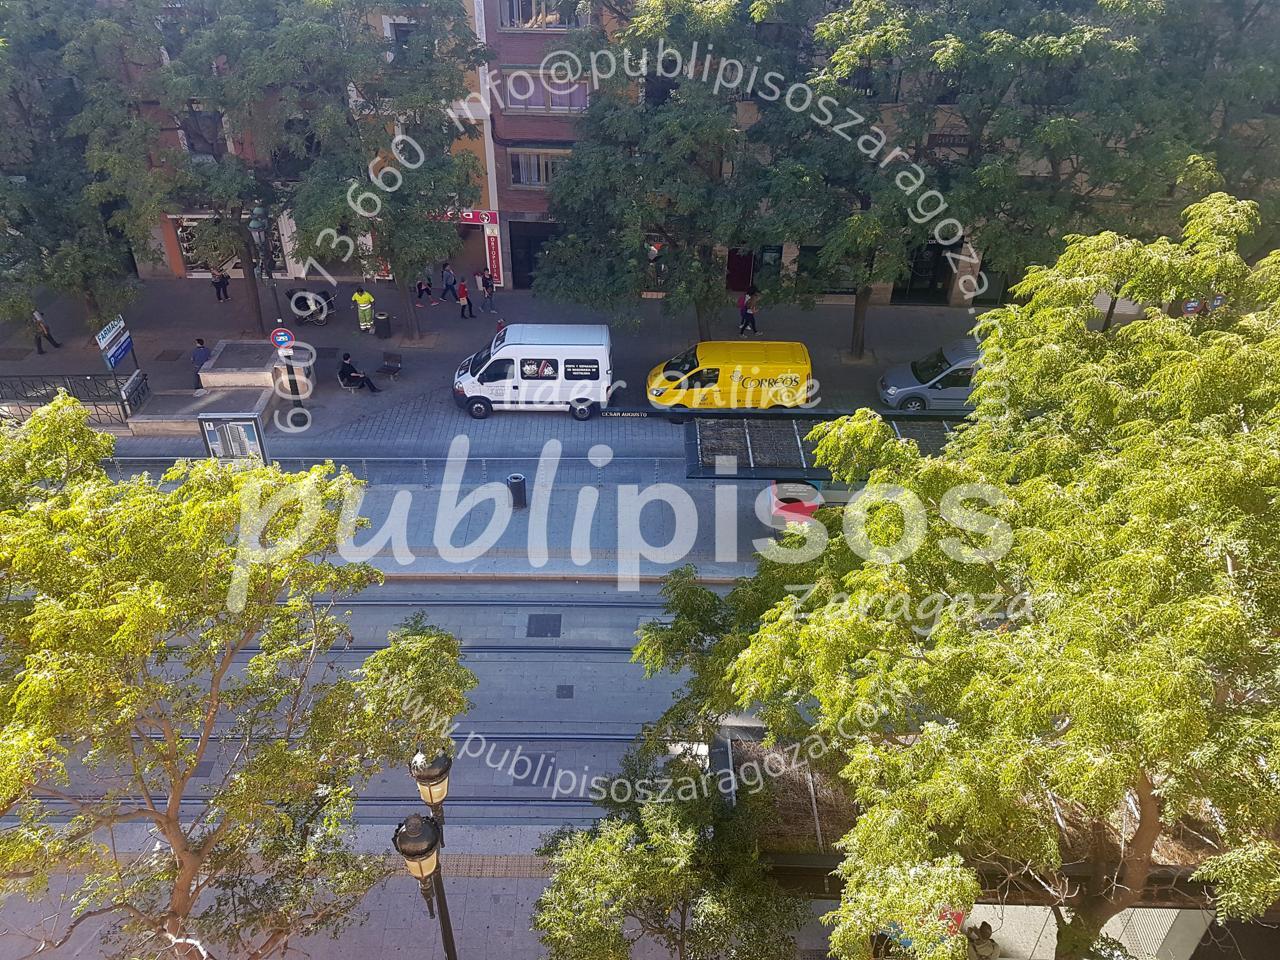 Venta Atico Duplex Obra Nueva Centro Casco Histórico Zaragoza|PUBLIPISOS Inmobiliarias-18